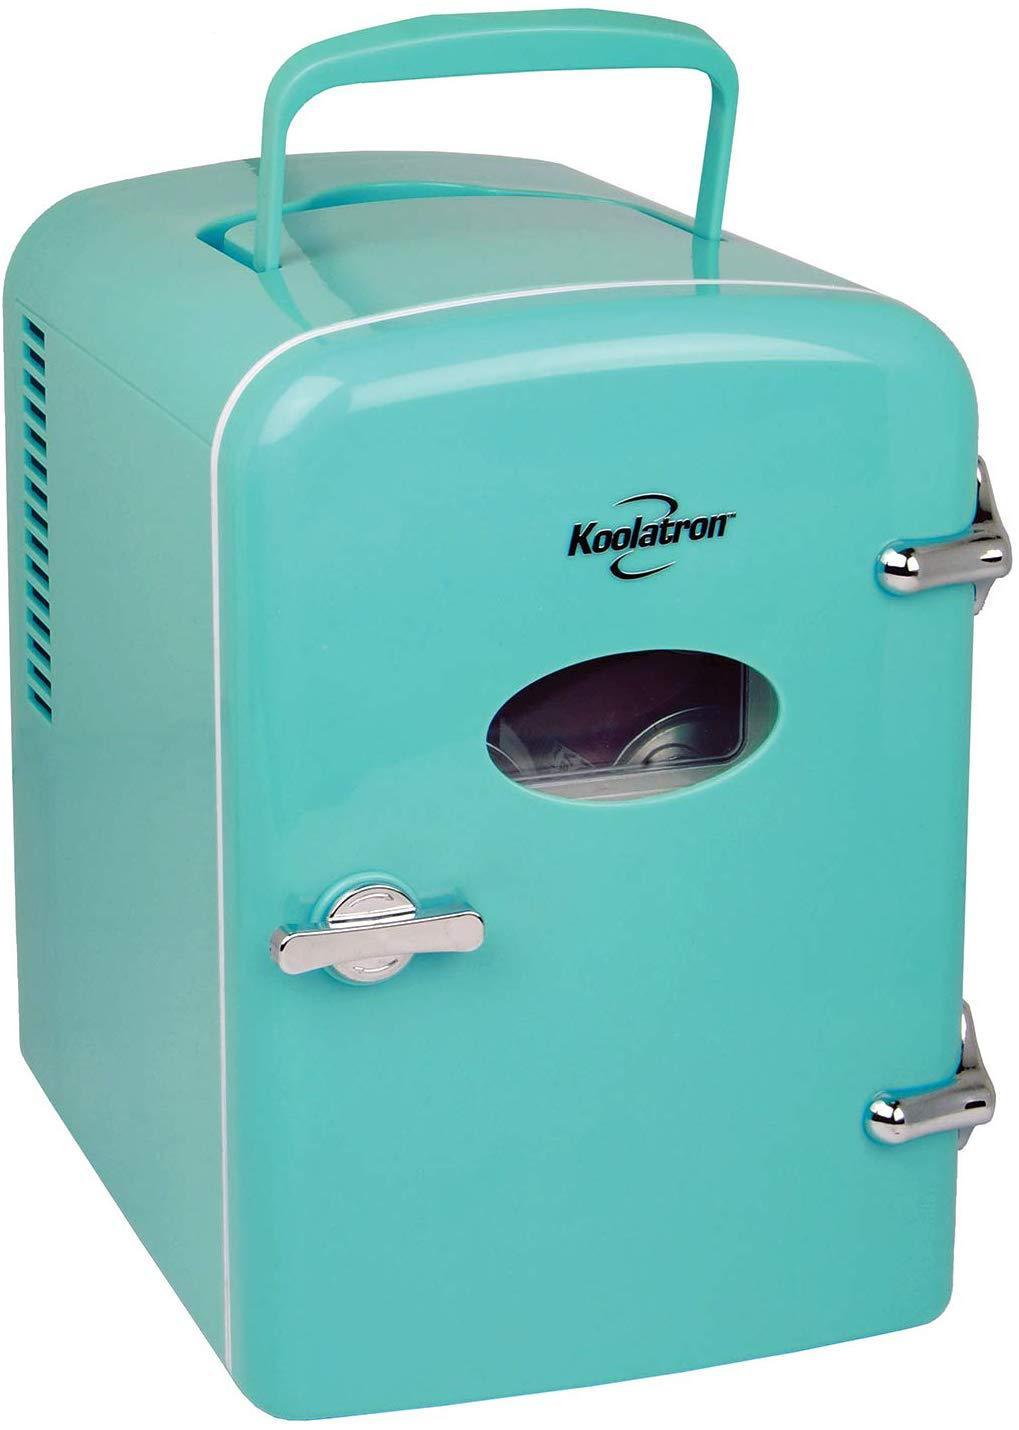 photo of retro mini fridge